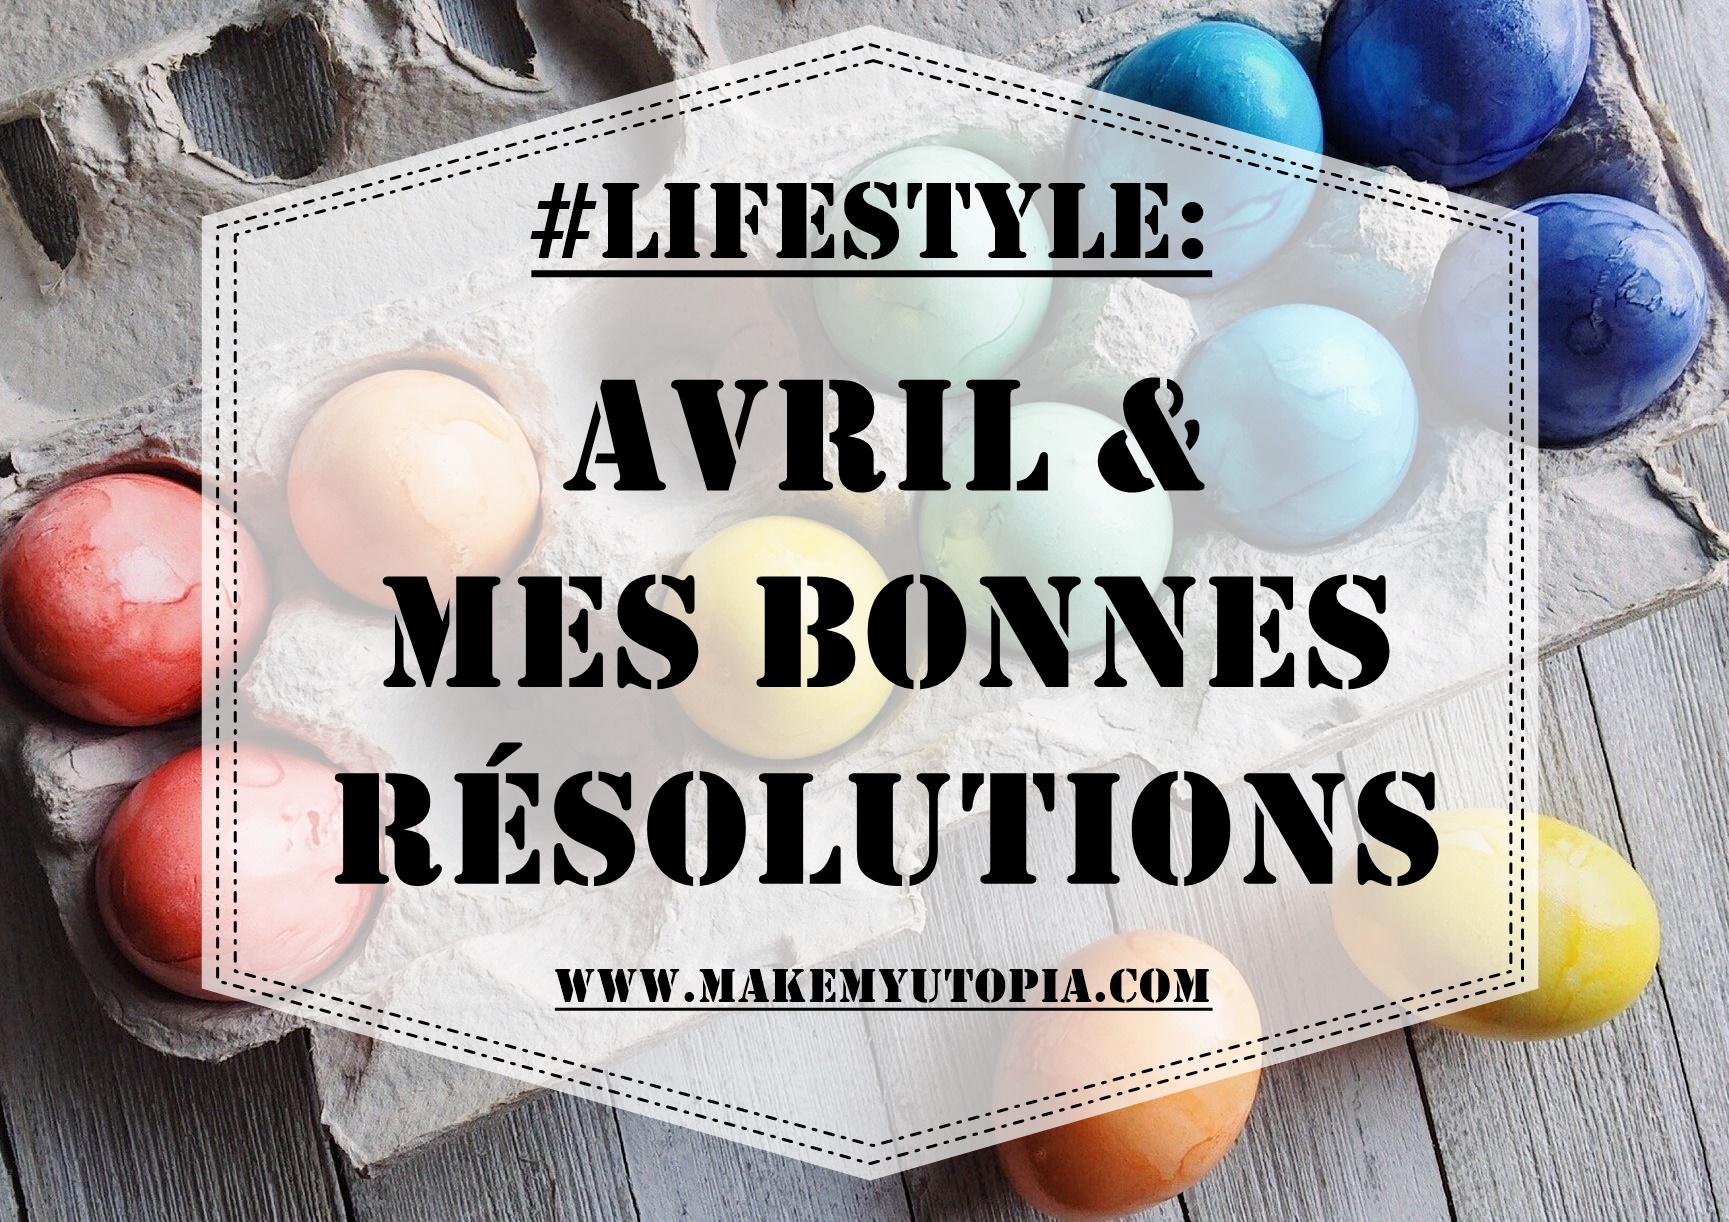 #LIFESTYLE - résolutions objectifs Avril - www.makemyutopia.com